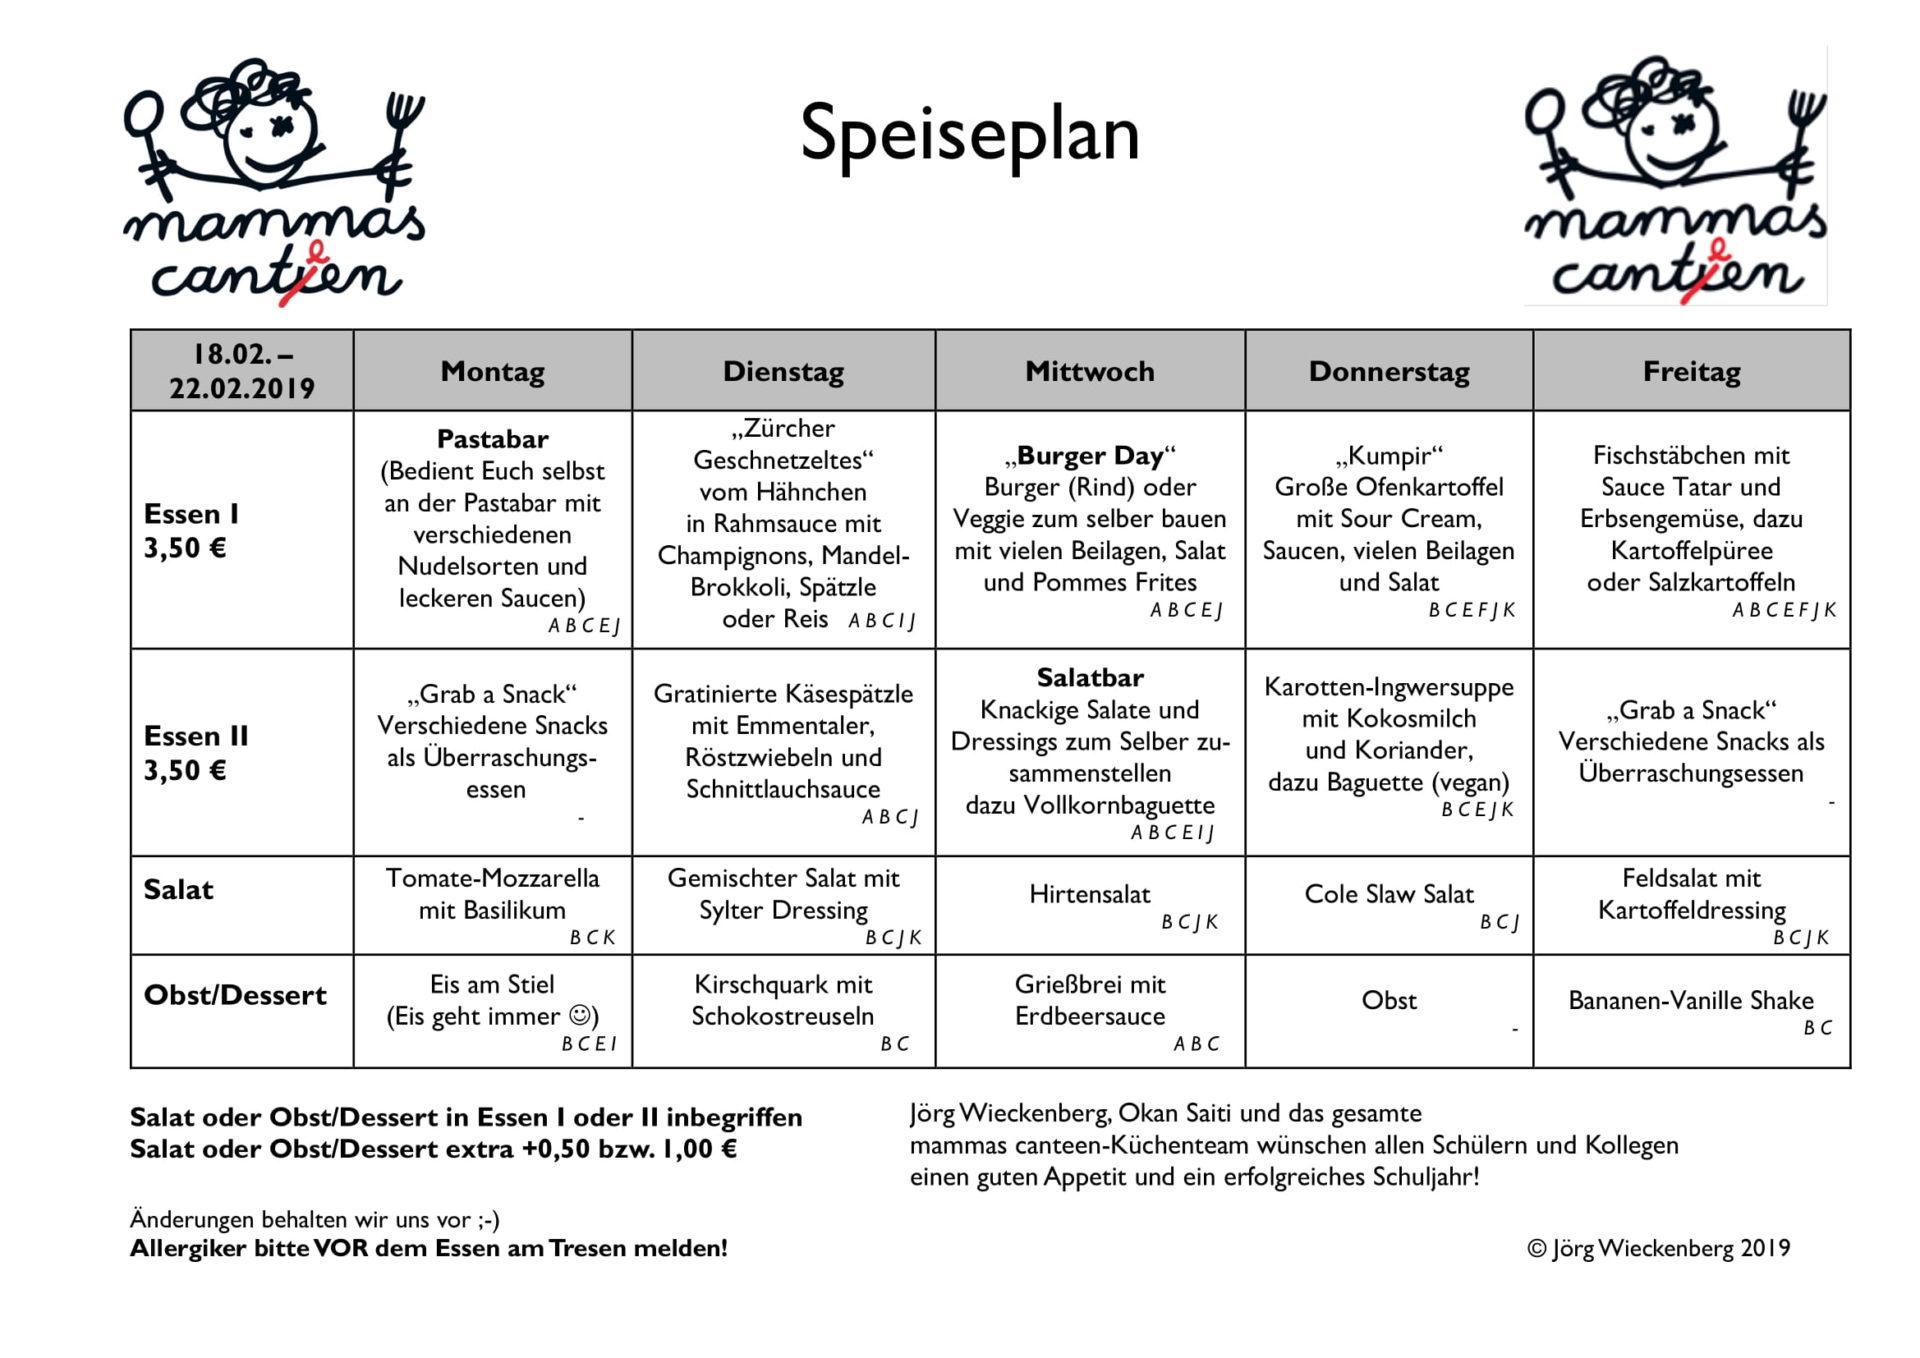 mammas canteen Speiseplan 18.02. -22.02.2019-1